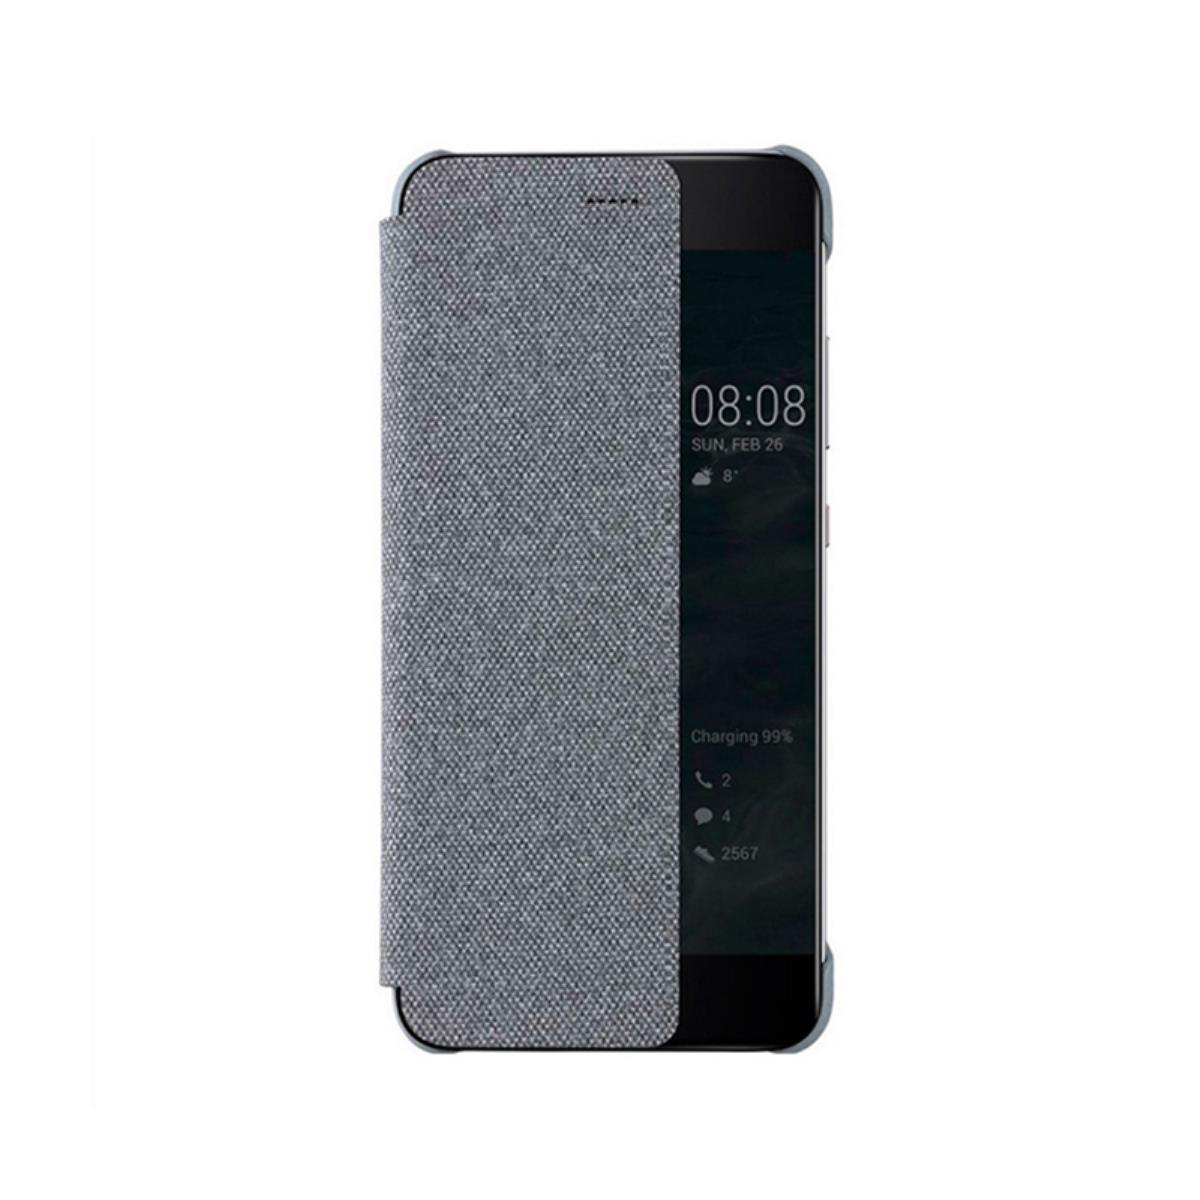 "Samsung Galaxy Note 8 6.3"" 64GB Dual SIM Dourado"